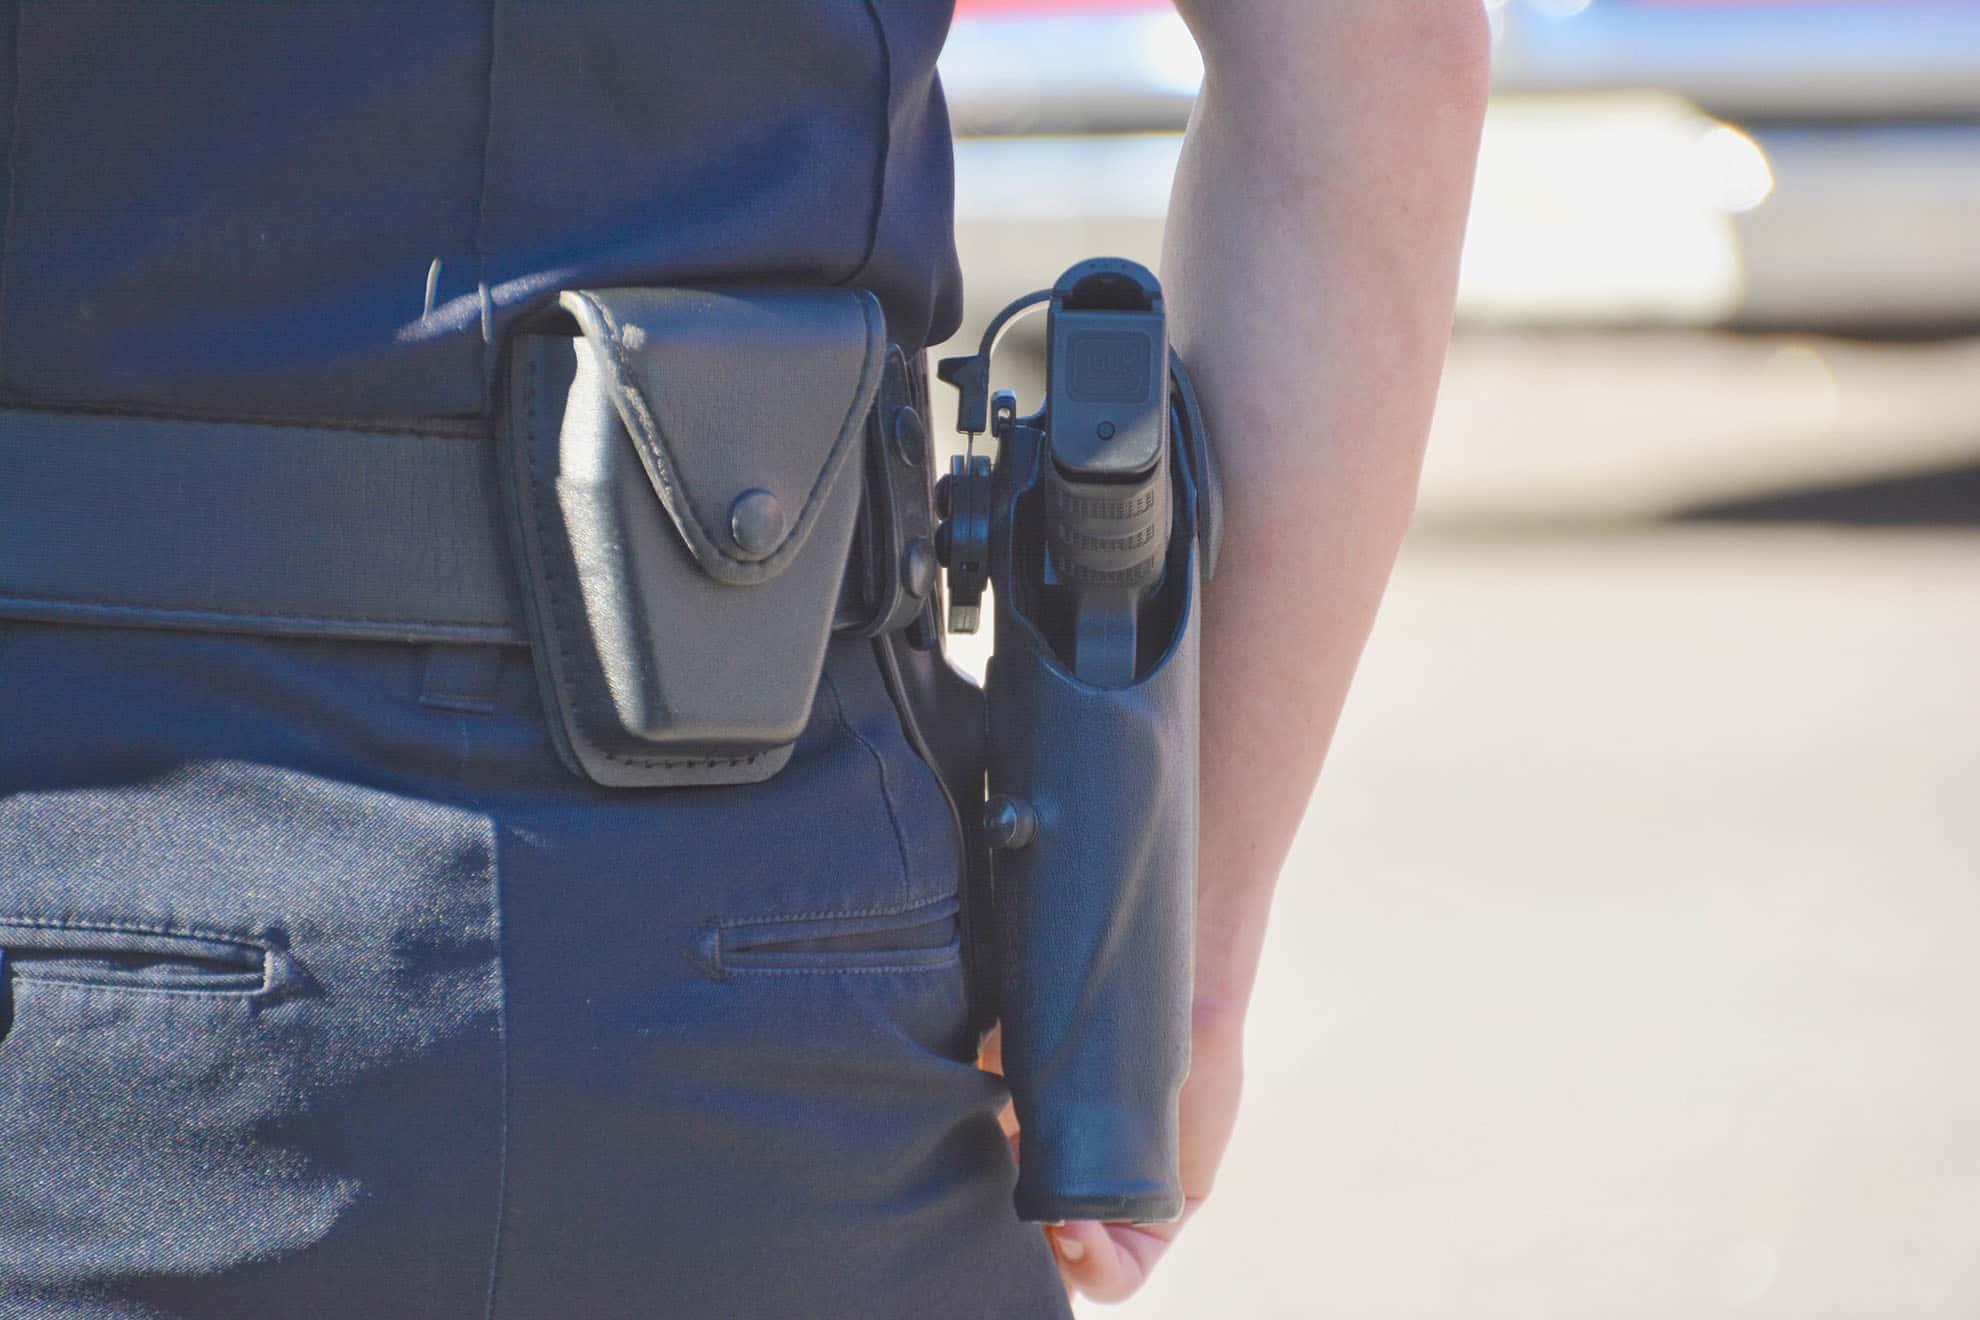 policeman-5F24ZE9-min